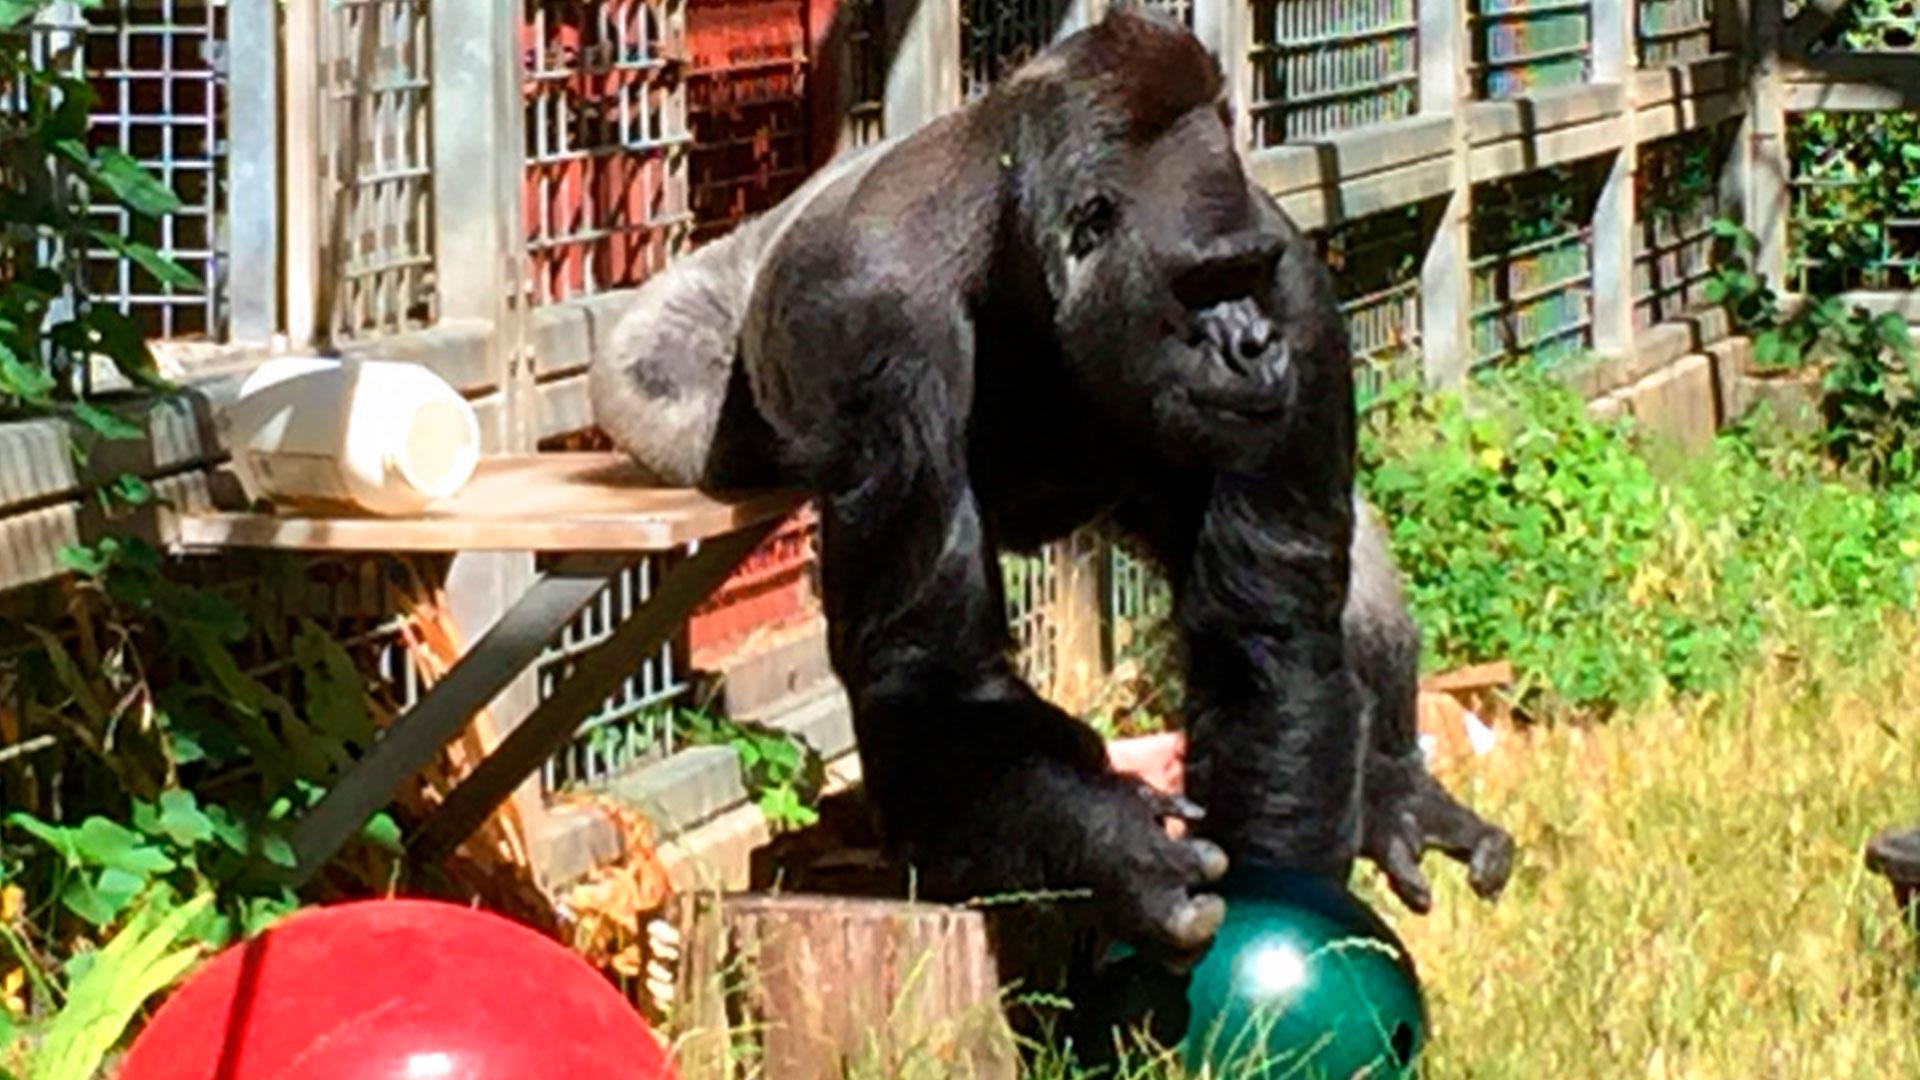 gorilla_1543891910989.jpg